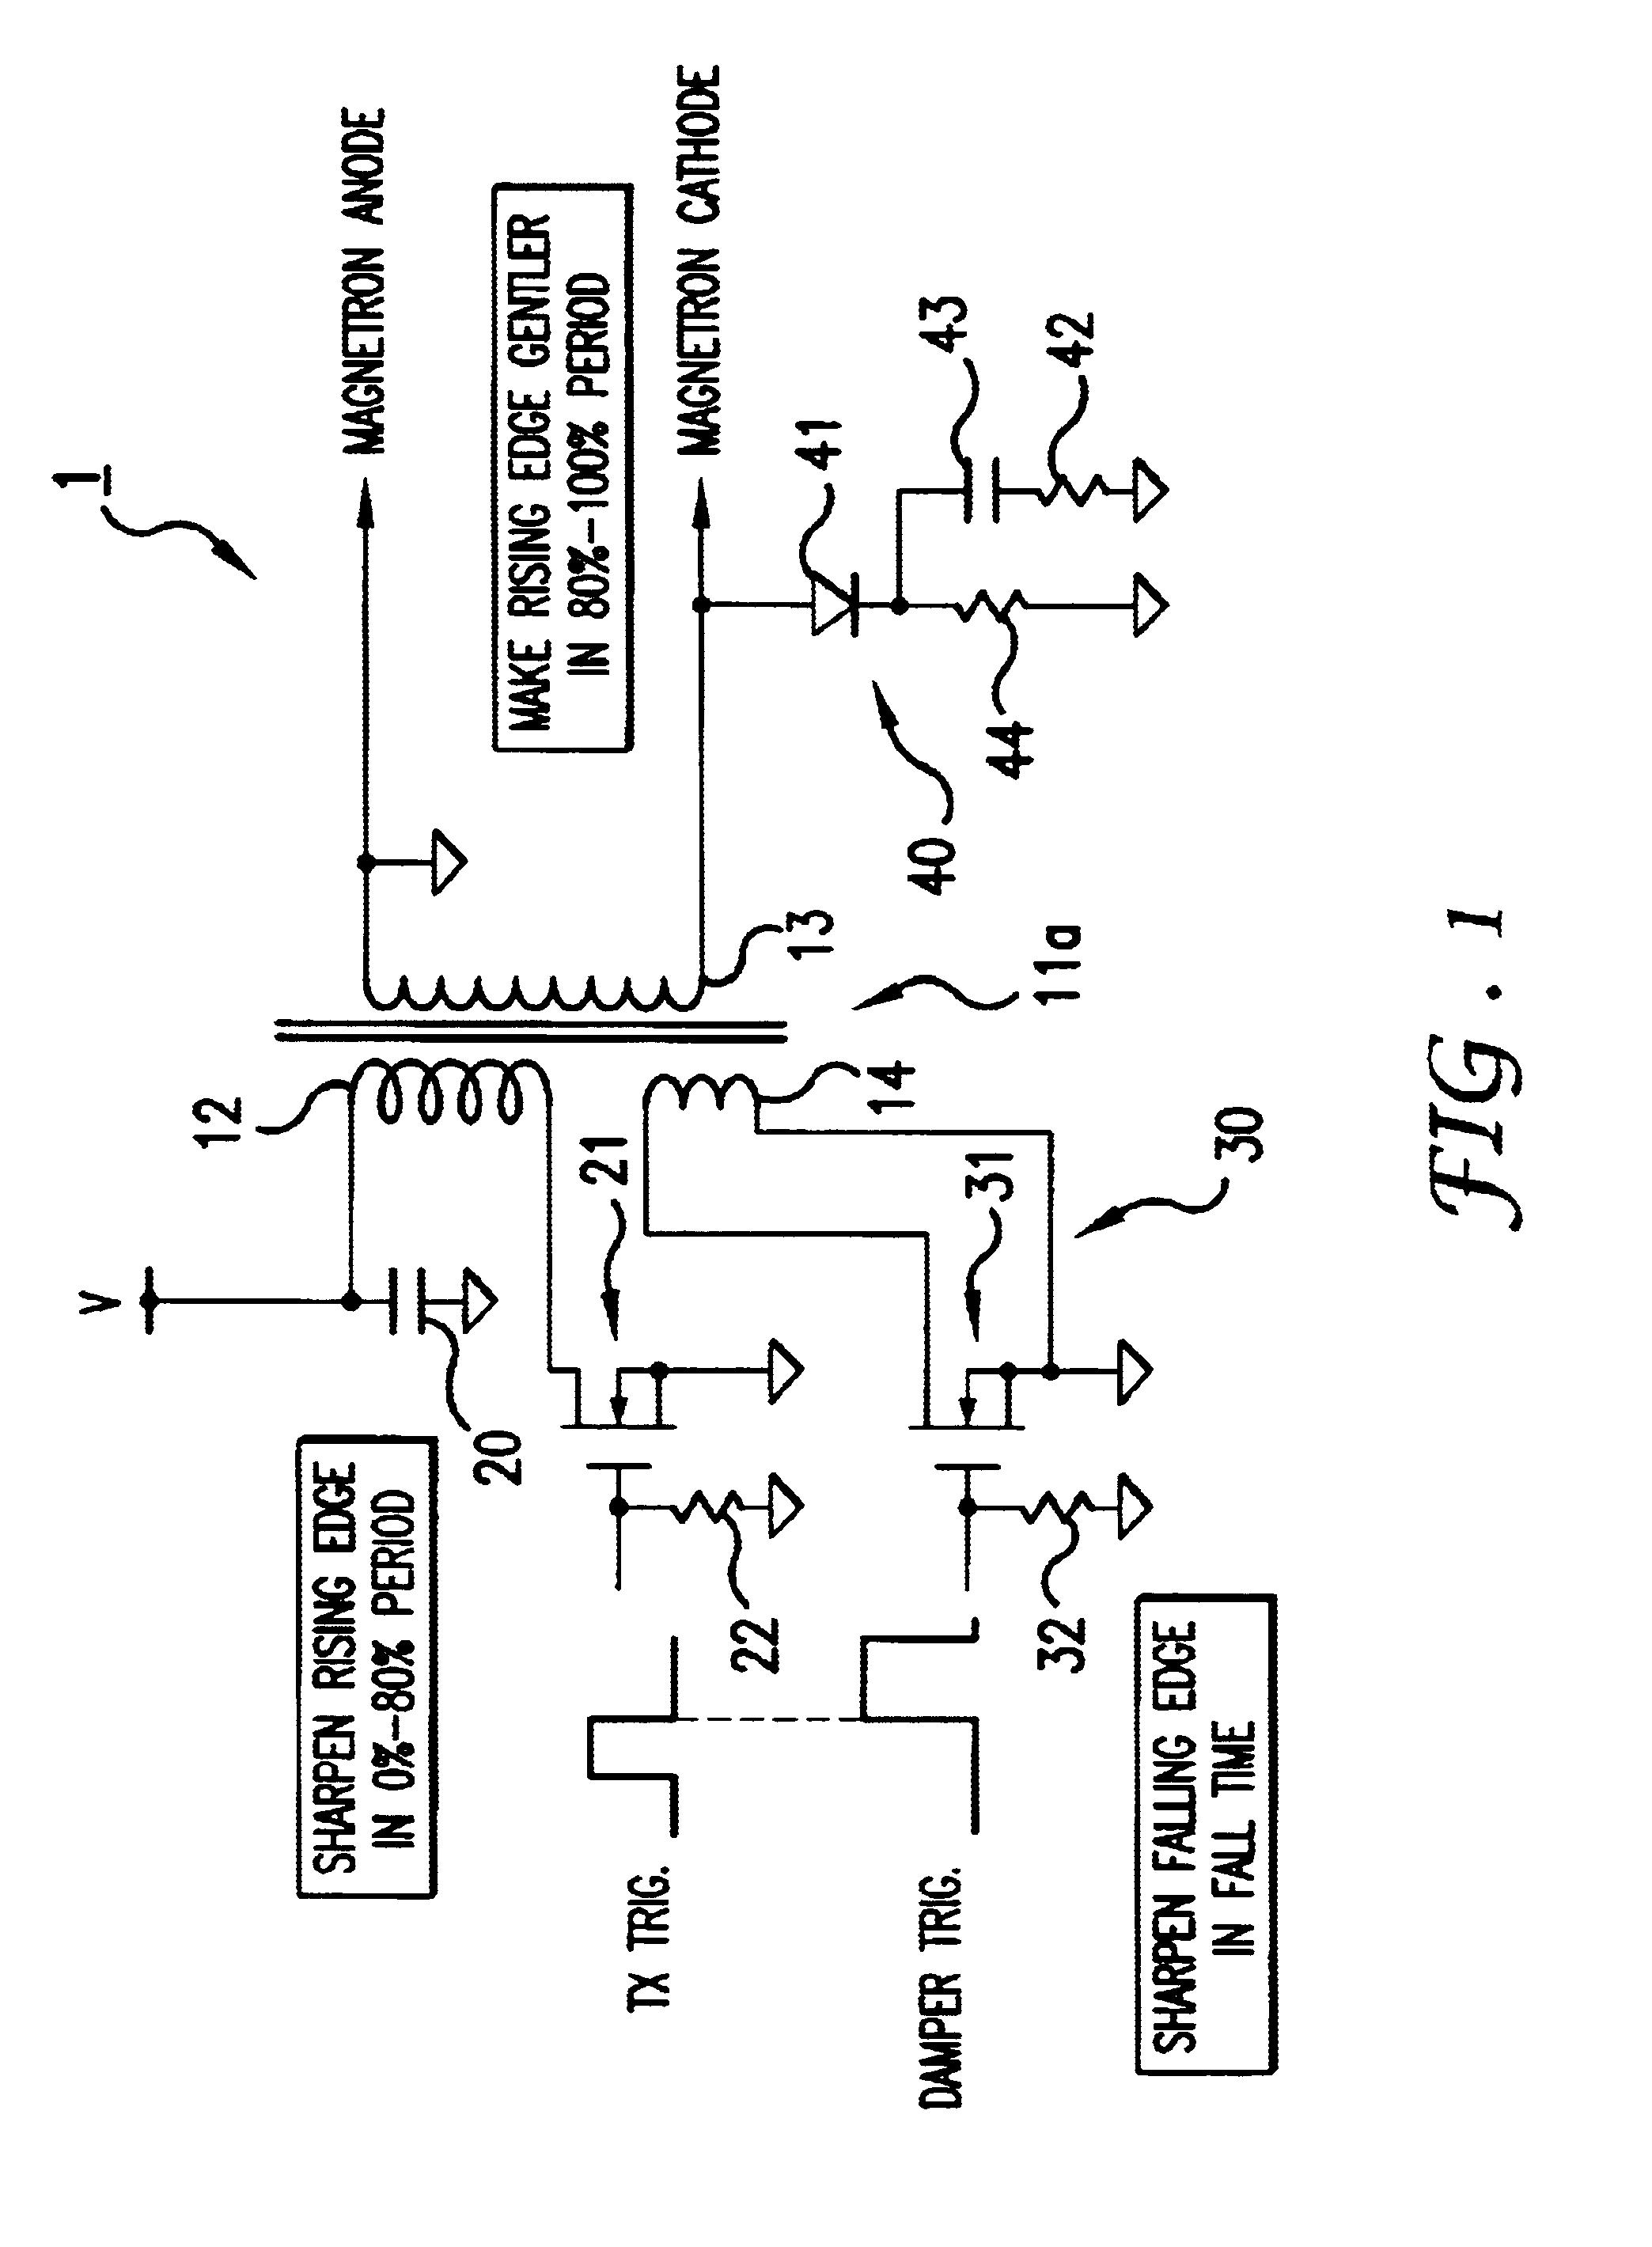 pulse generating circuit